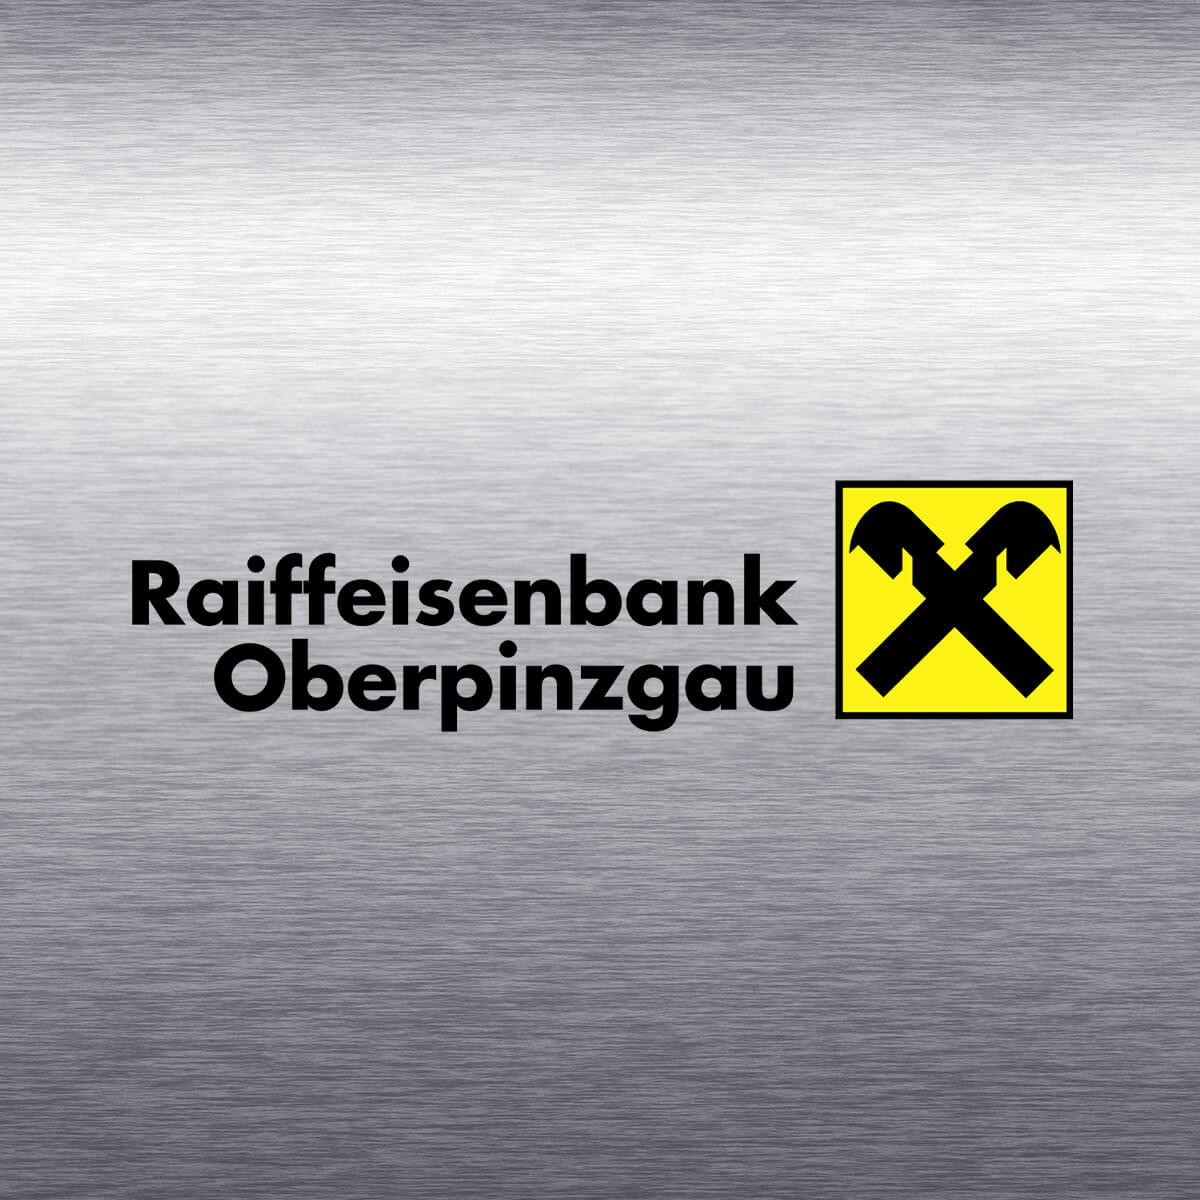 Raiffeisenbank-Oberpinzgau